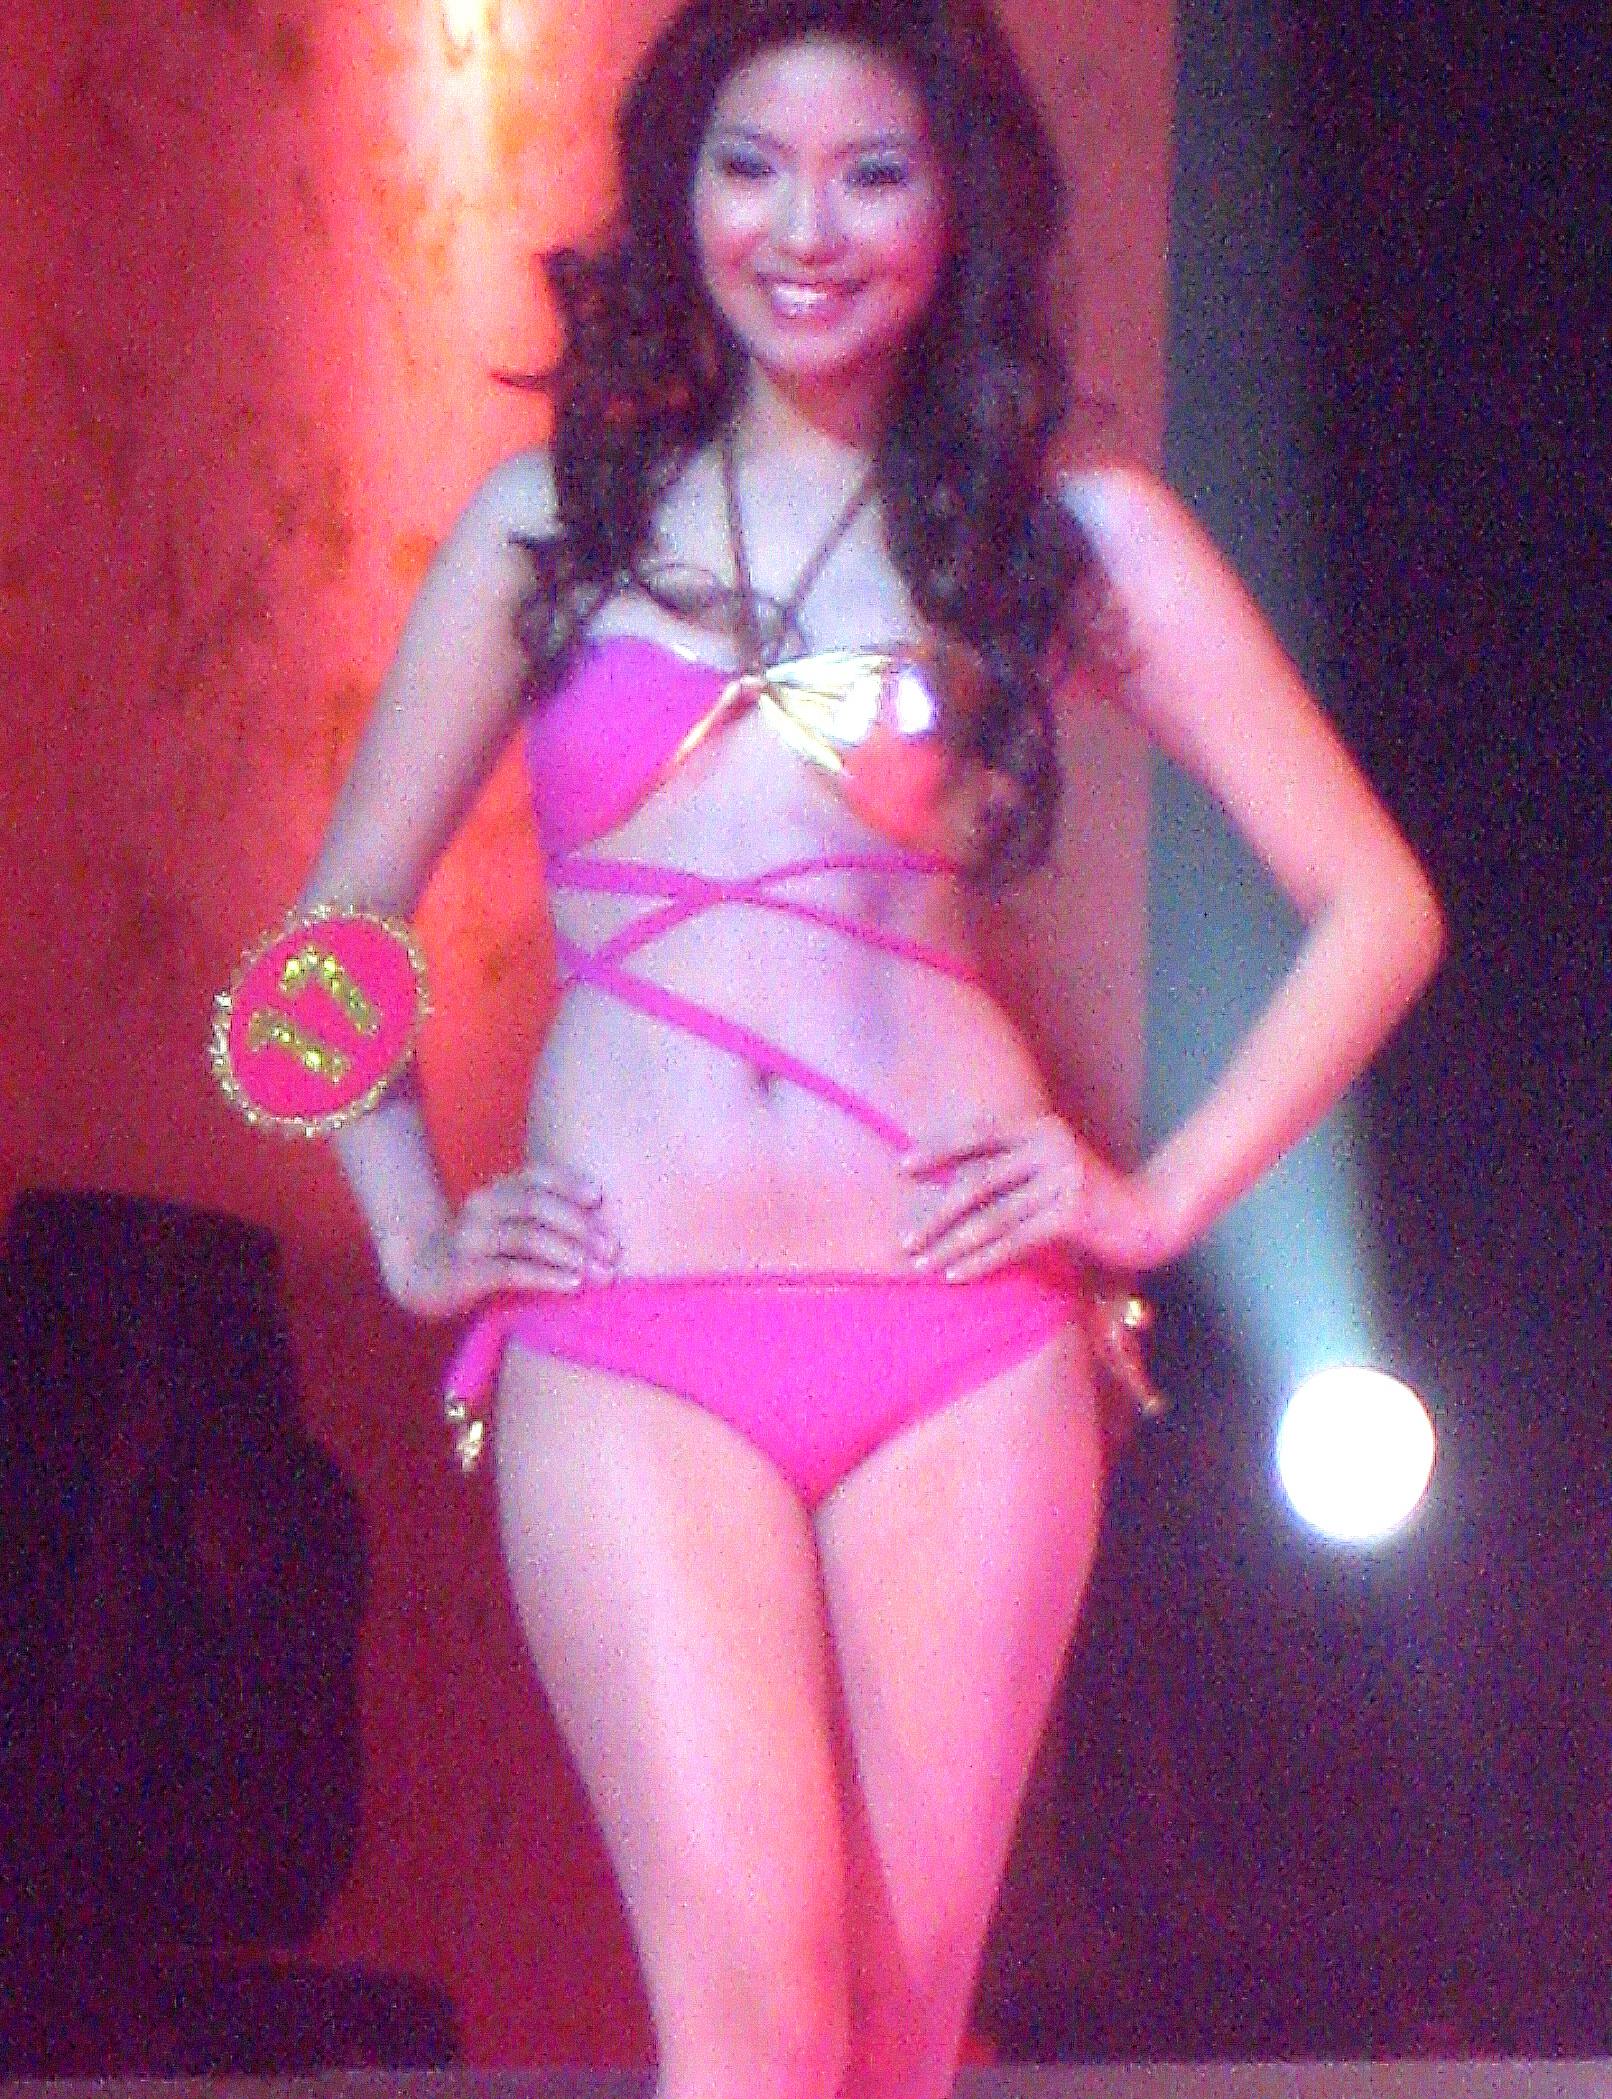 Candidate #17 Kim de Guzman (Ms. Bikini World)